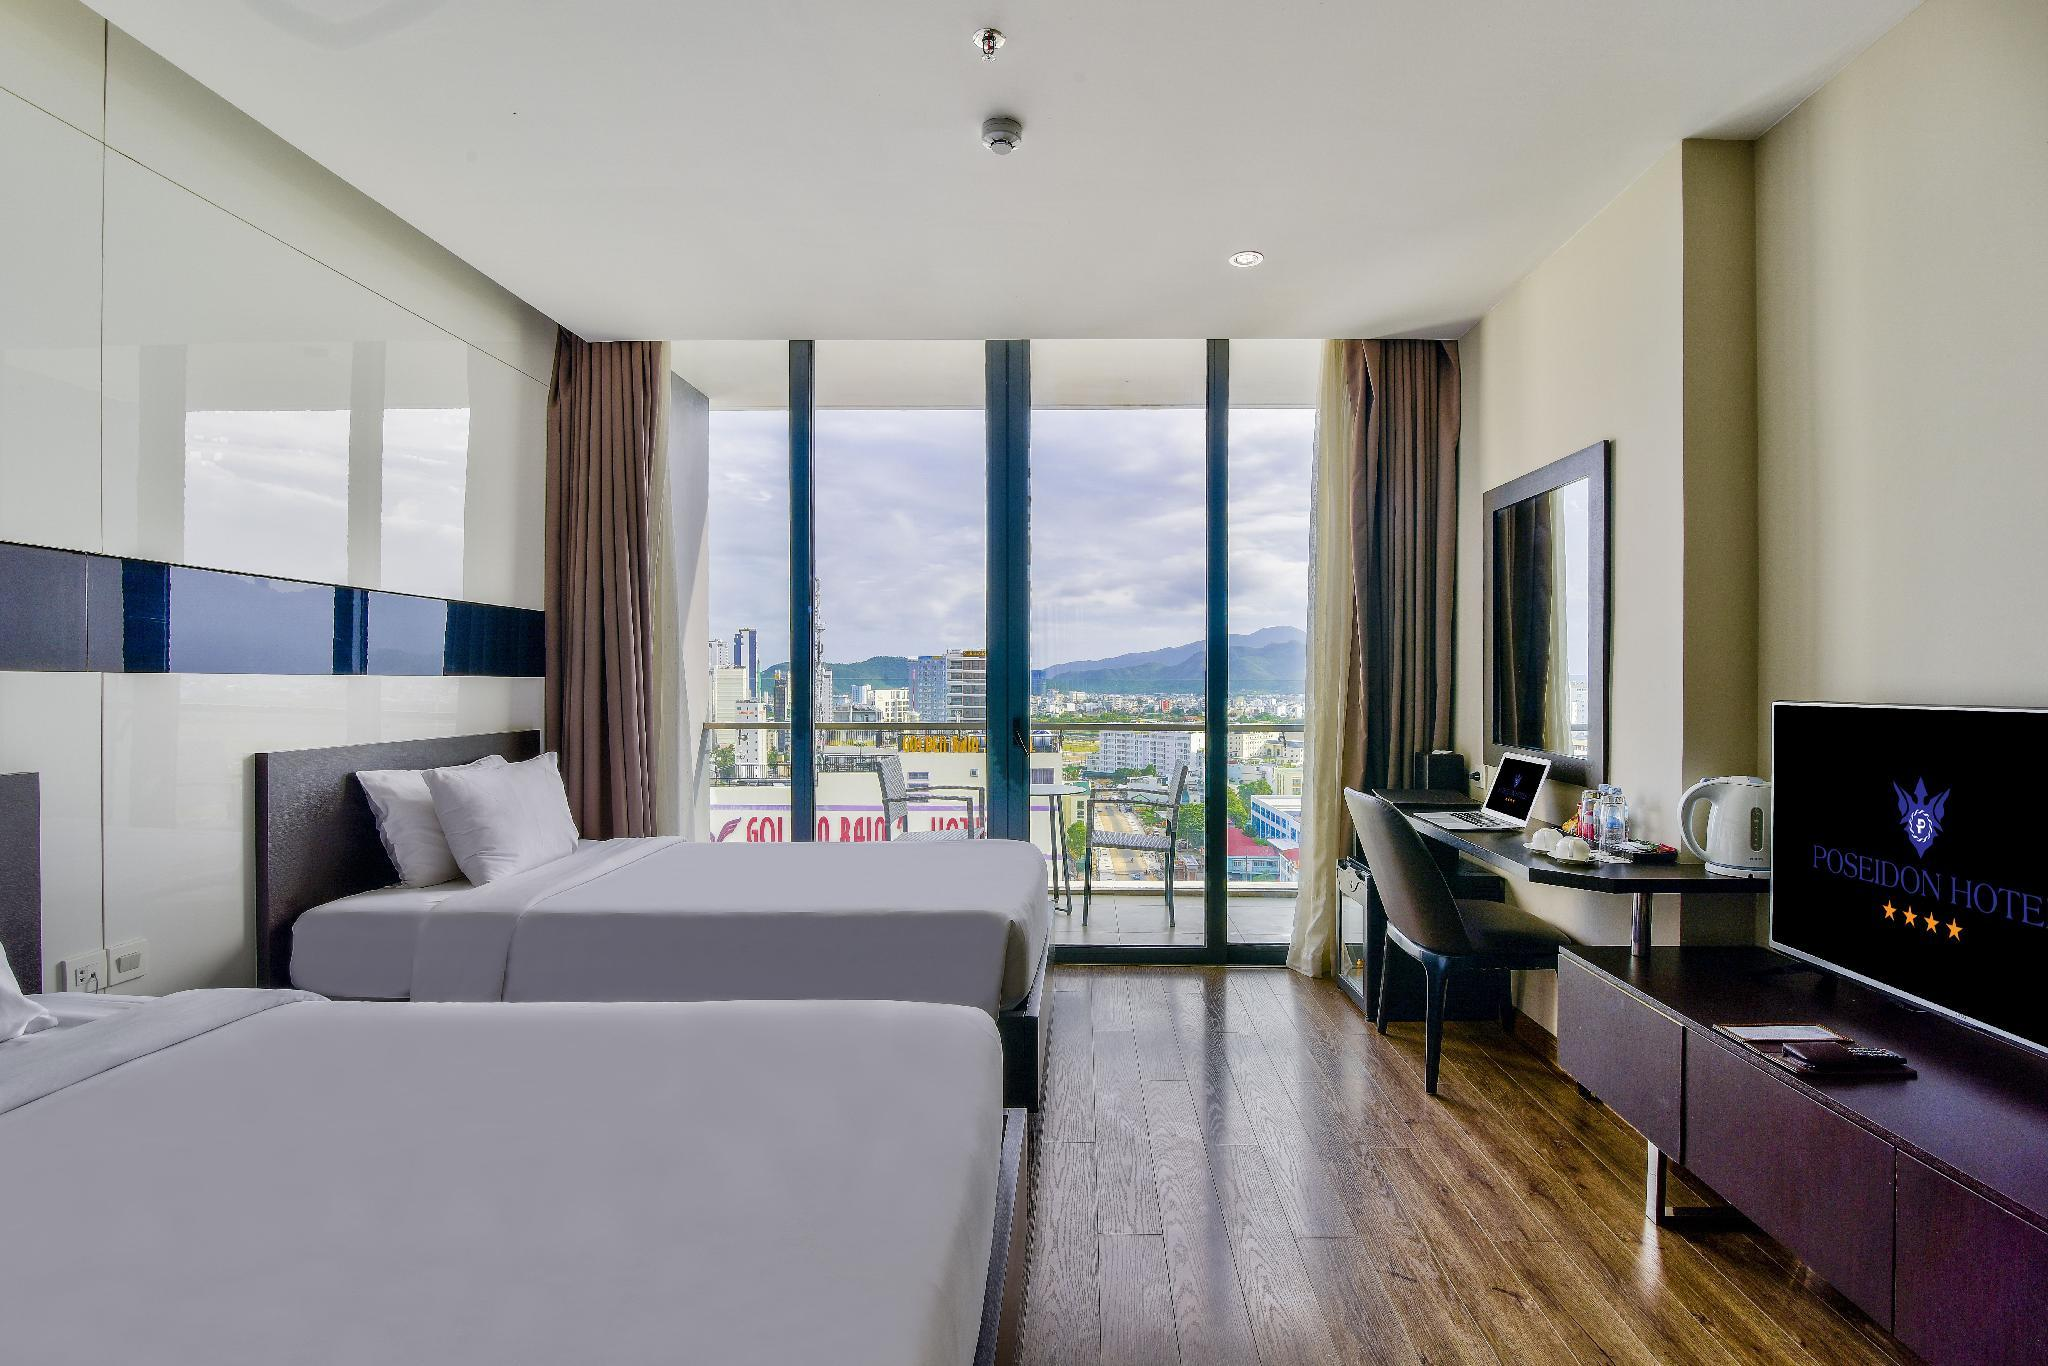 Poseidon Nha Trang Hotel Booking Agoda Com Best Price